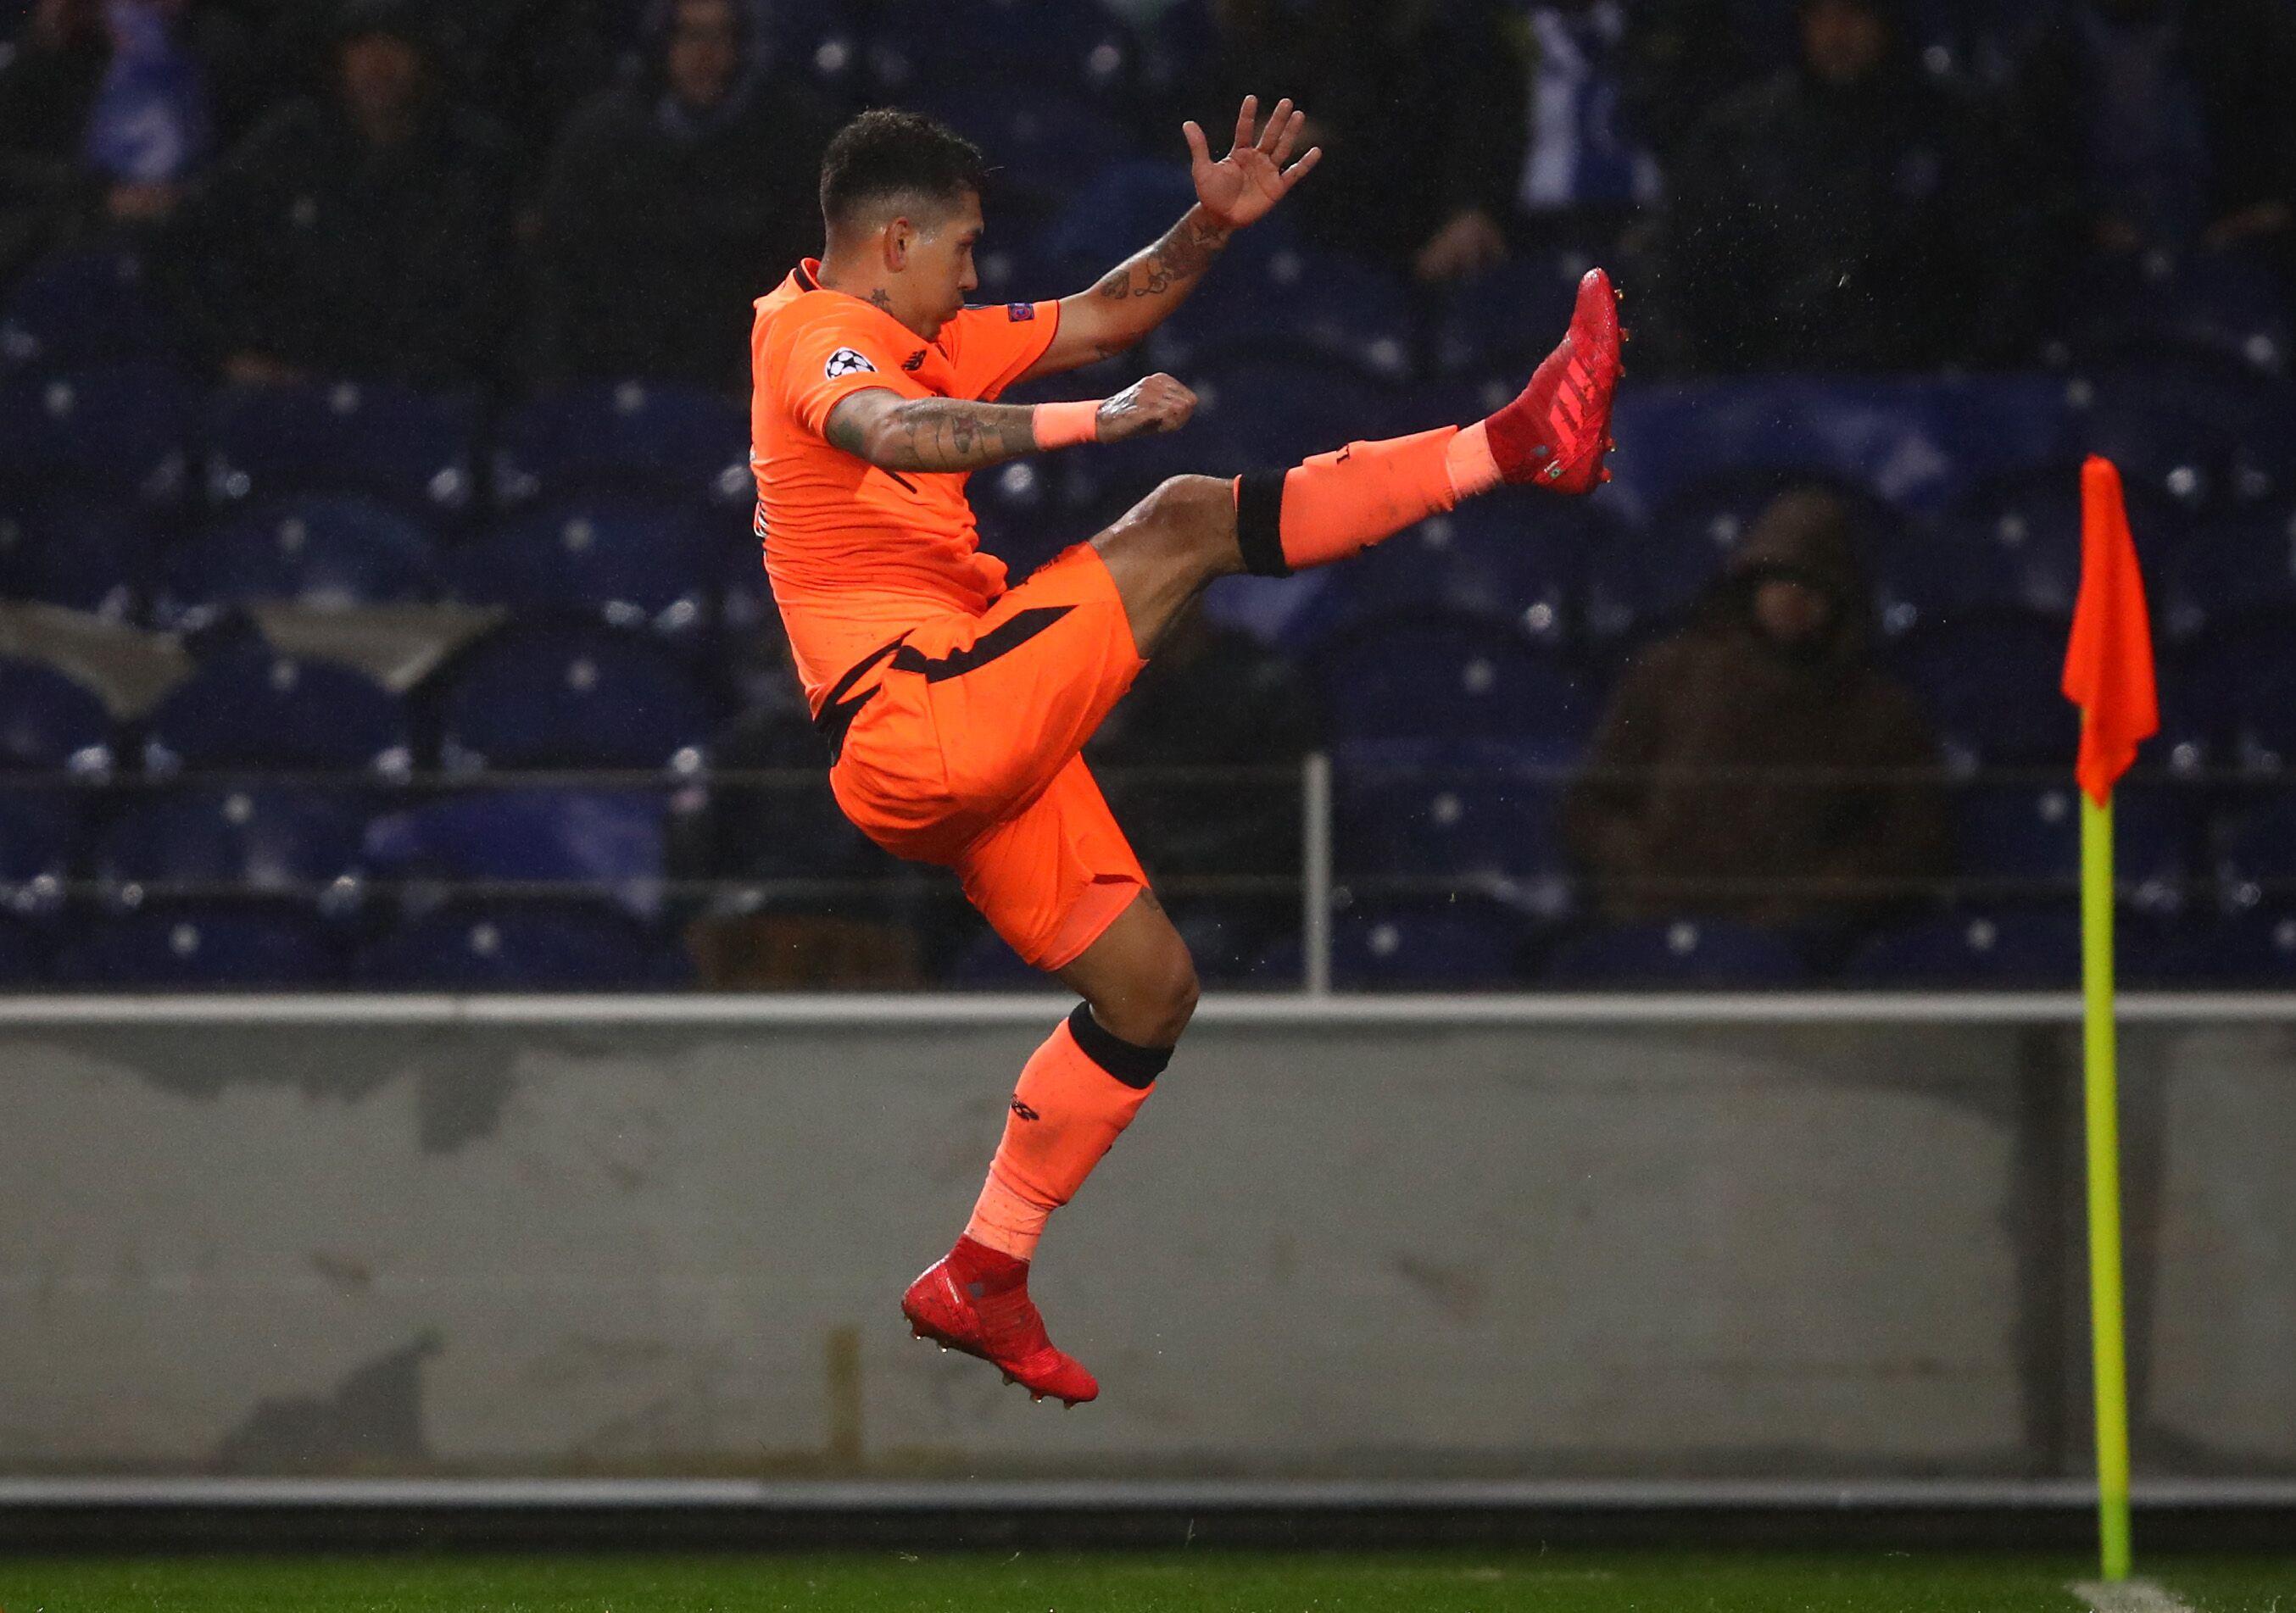 918302736-fc-porto-v-liverpool-uefa-champions-league-round-of-16-first-leg.jpg